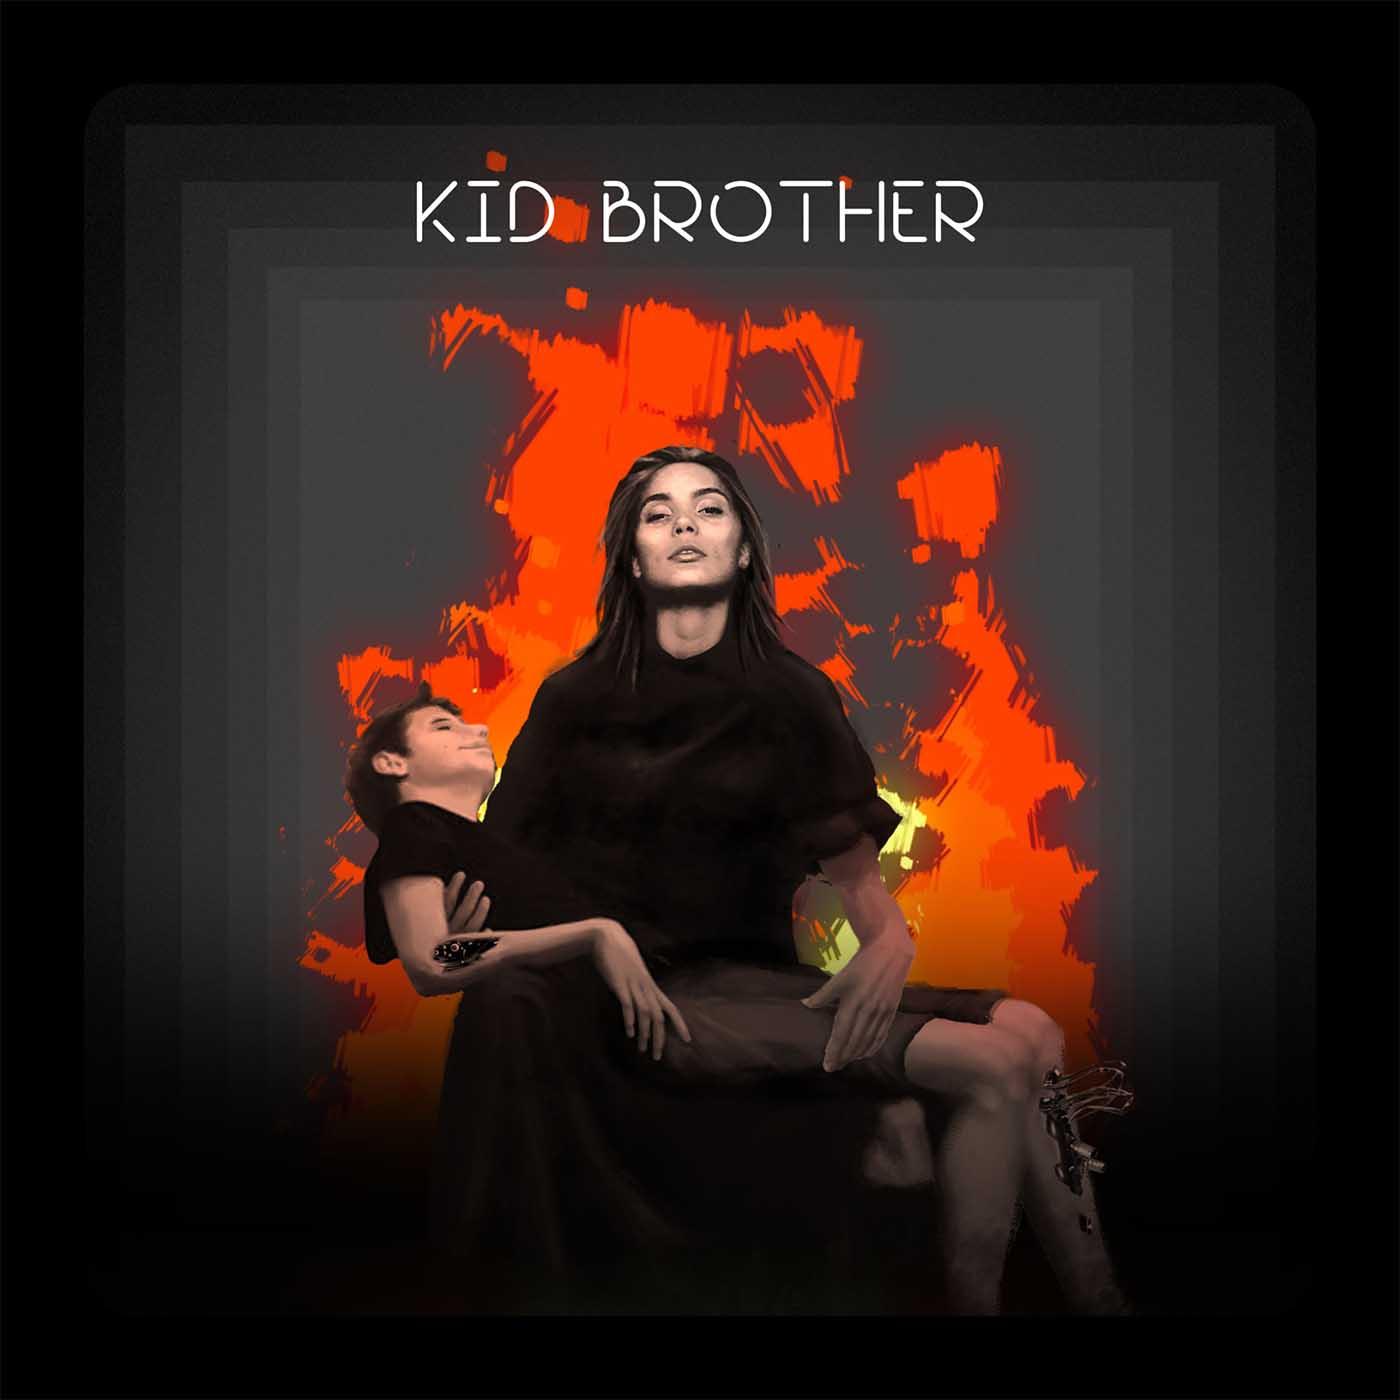 KID BROTHER   برادر کوچک